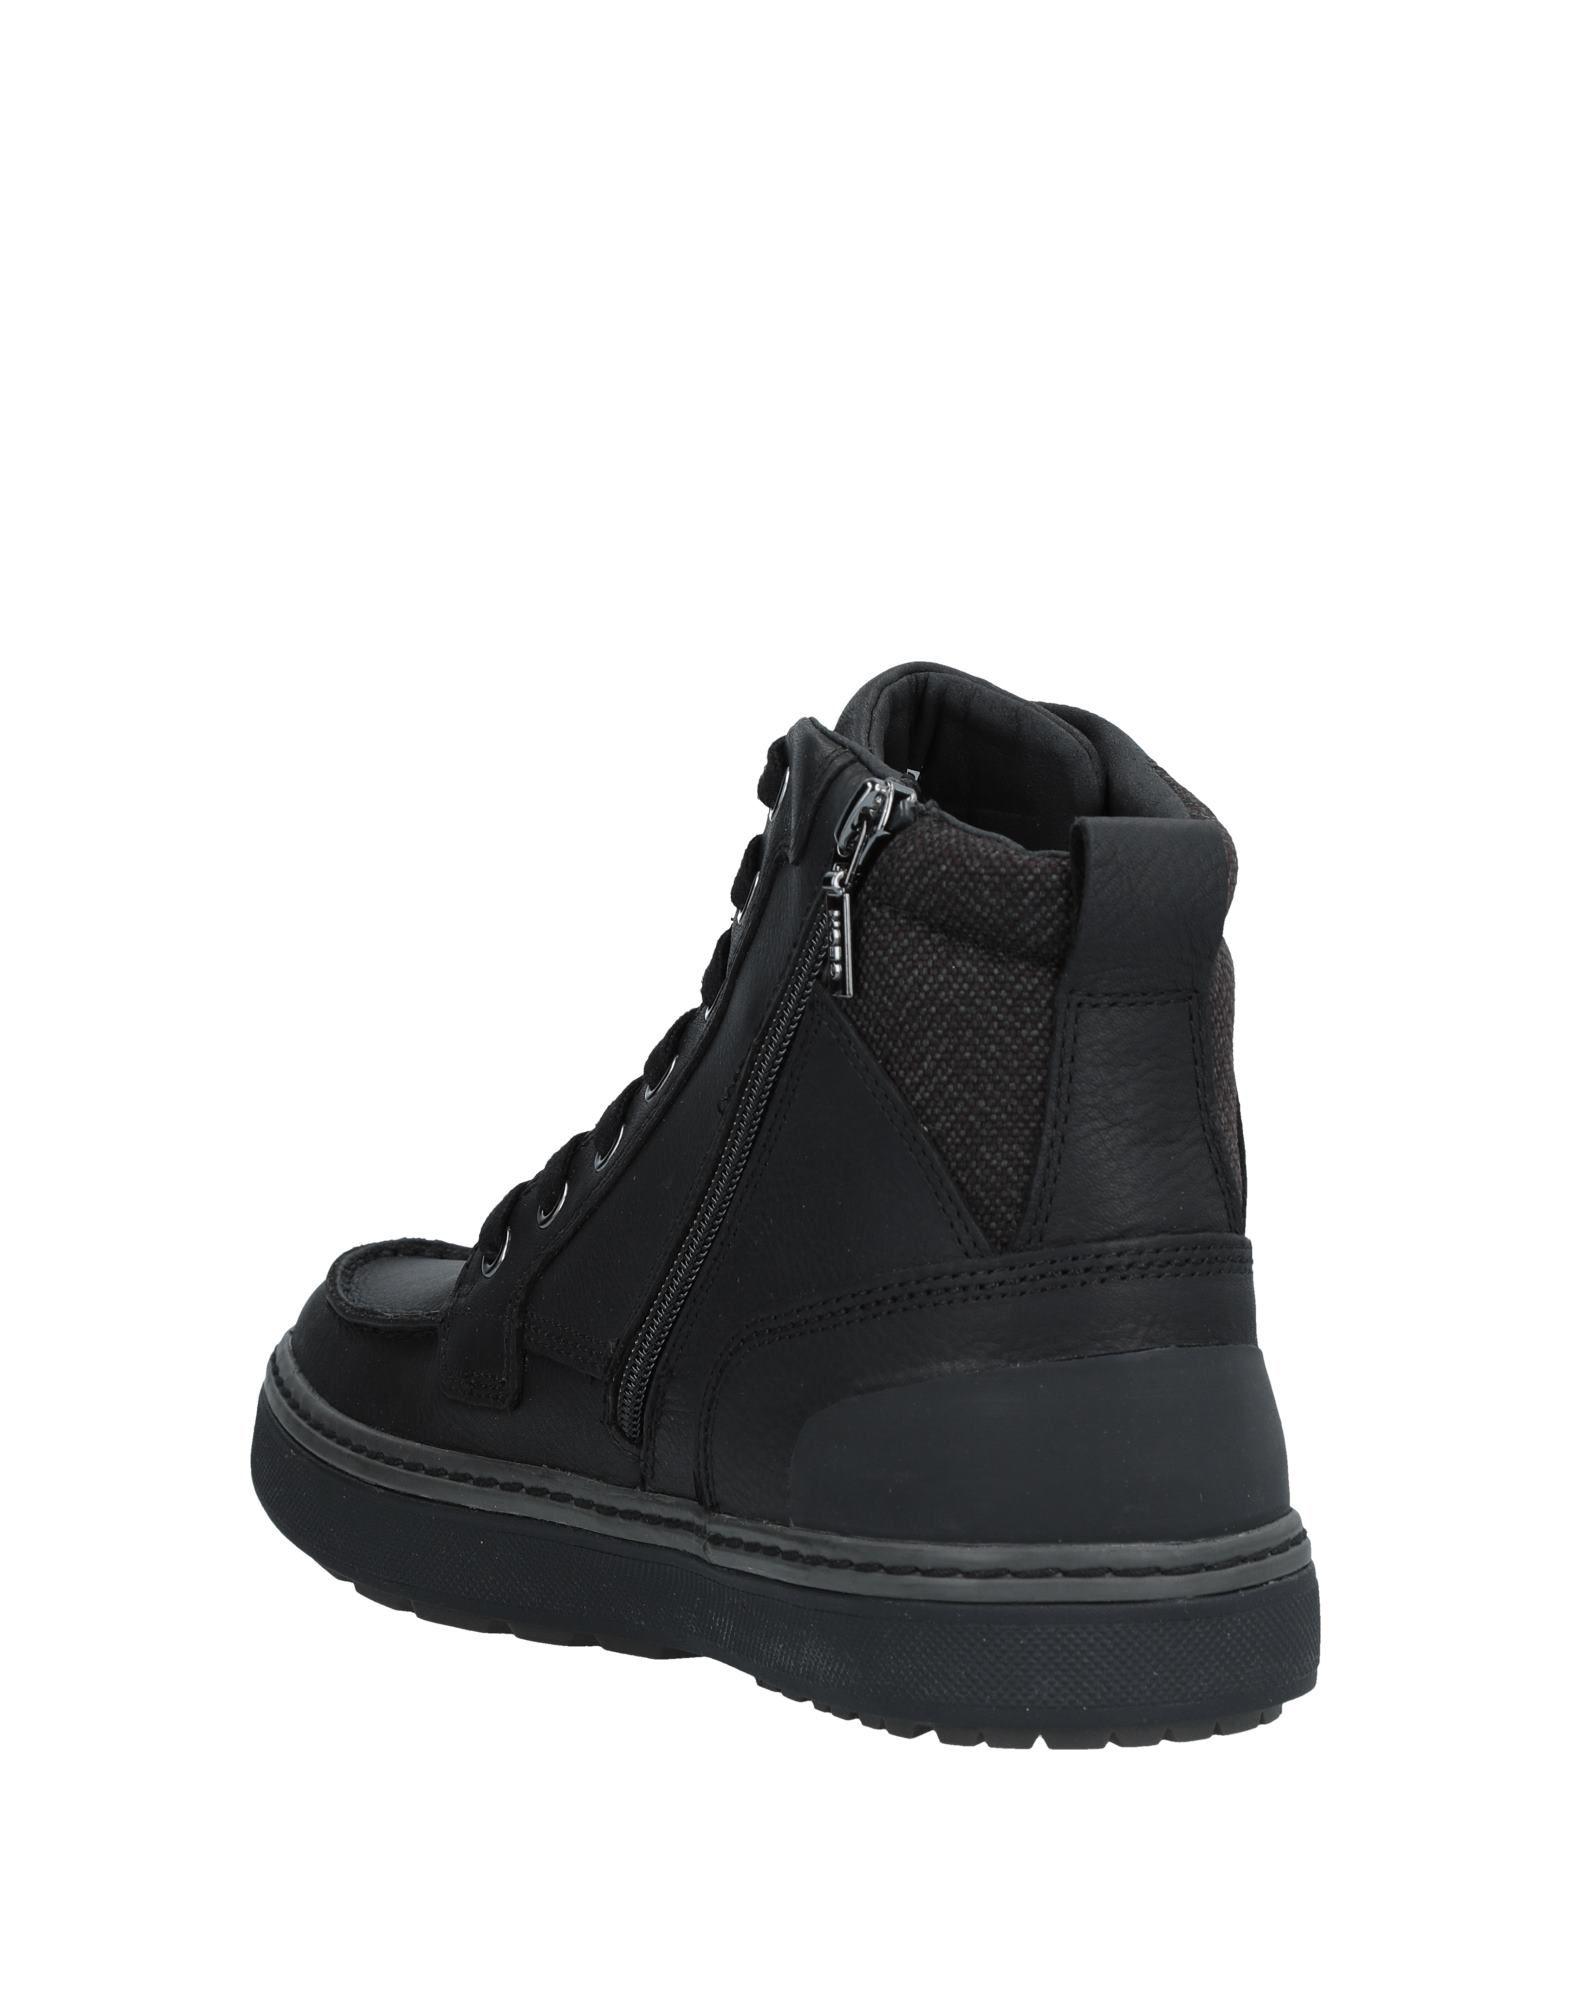 Rabatt echte Schuhe 11540130MK Geox Sneakers Herren  11540130MK Schuhe a72d18